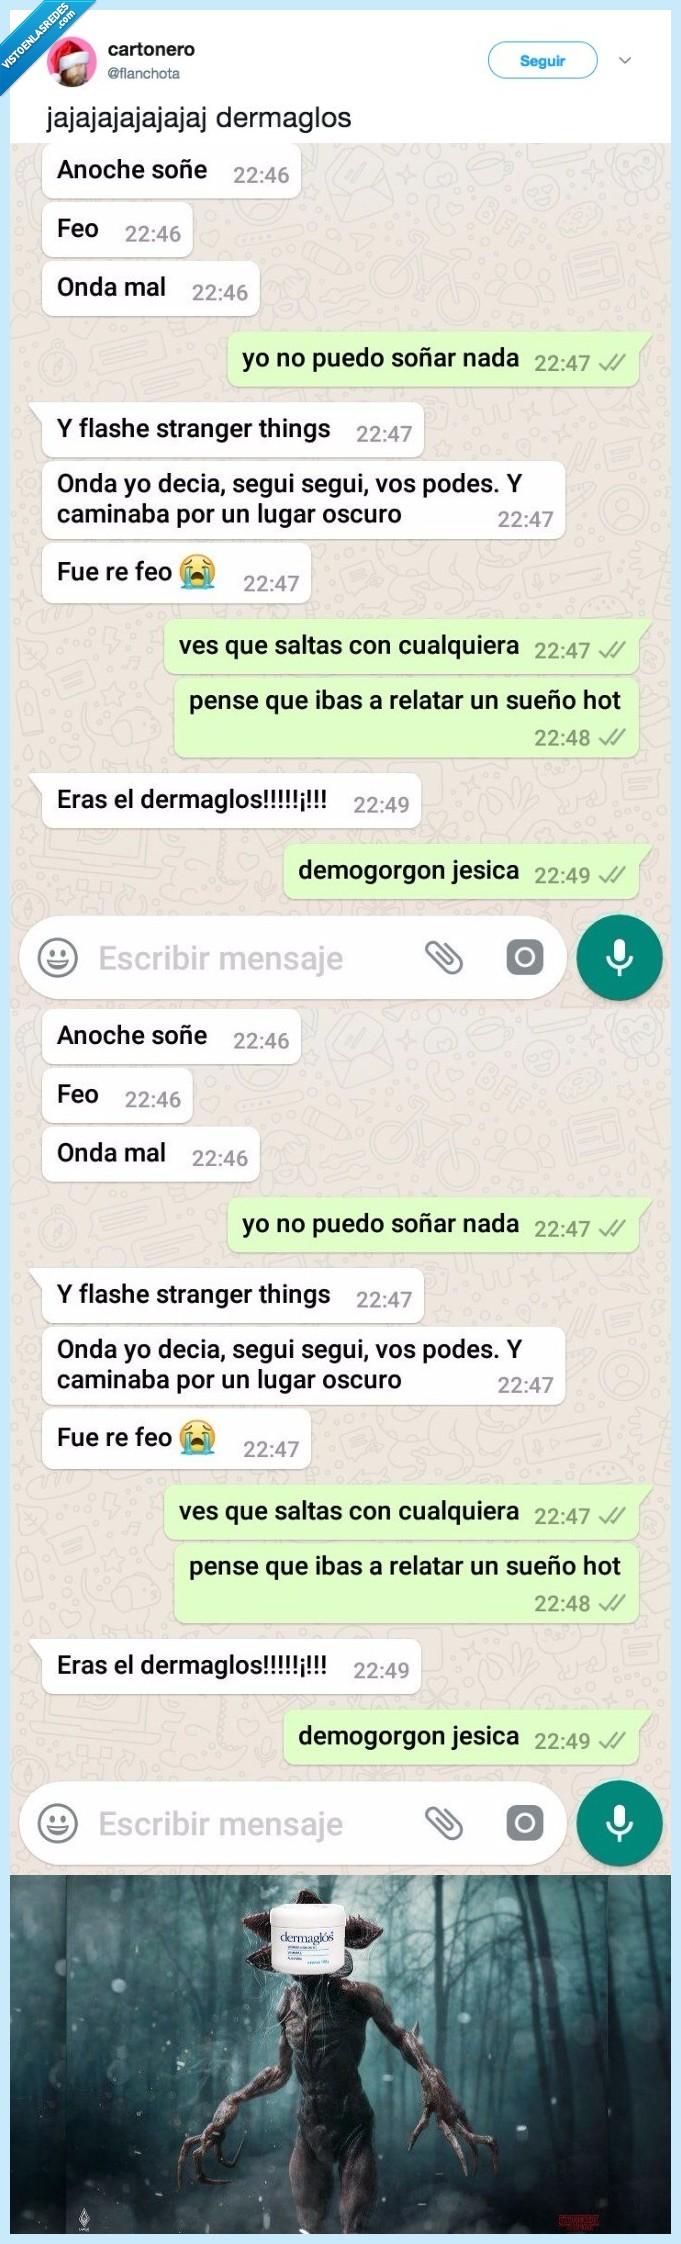 strangers,things ver